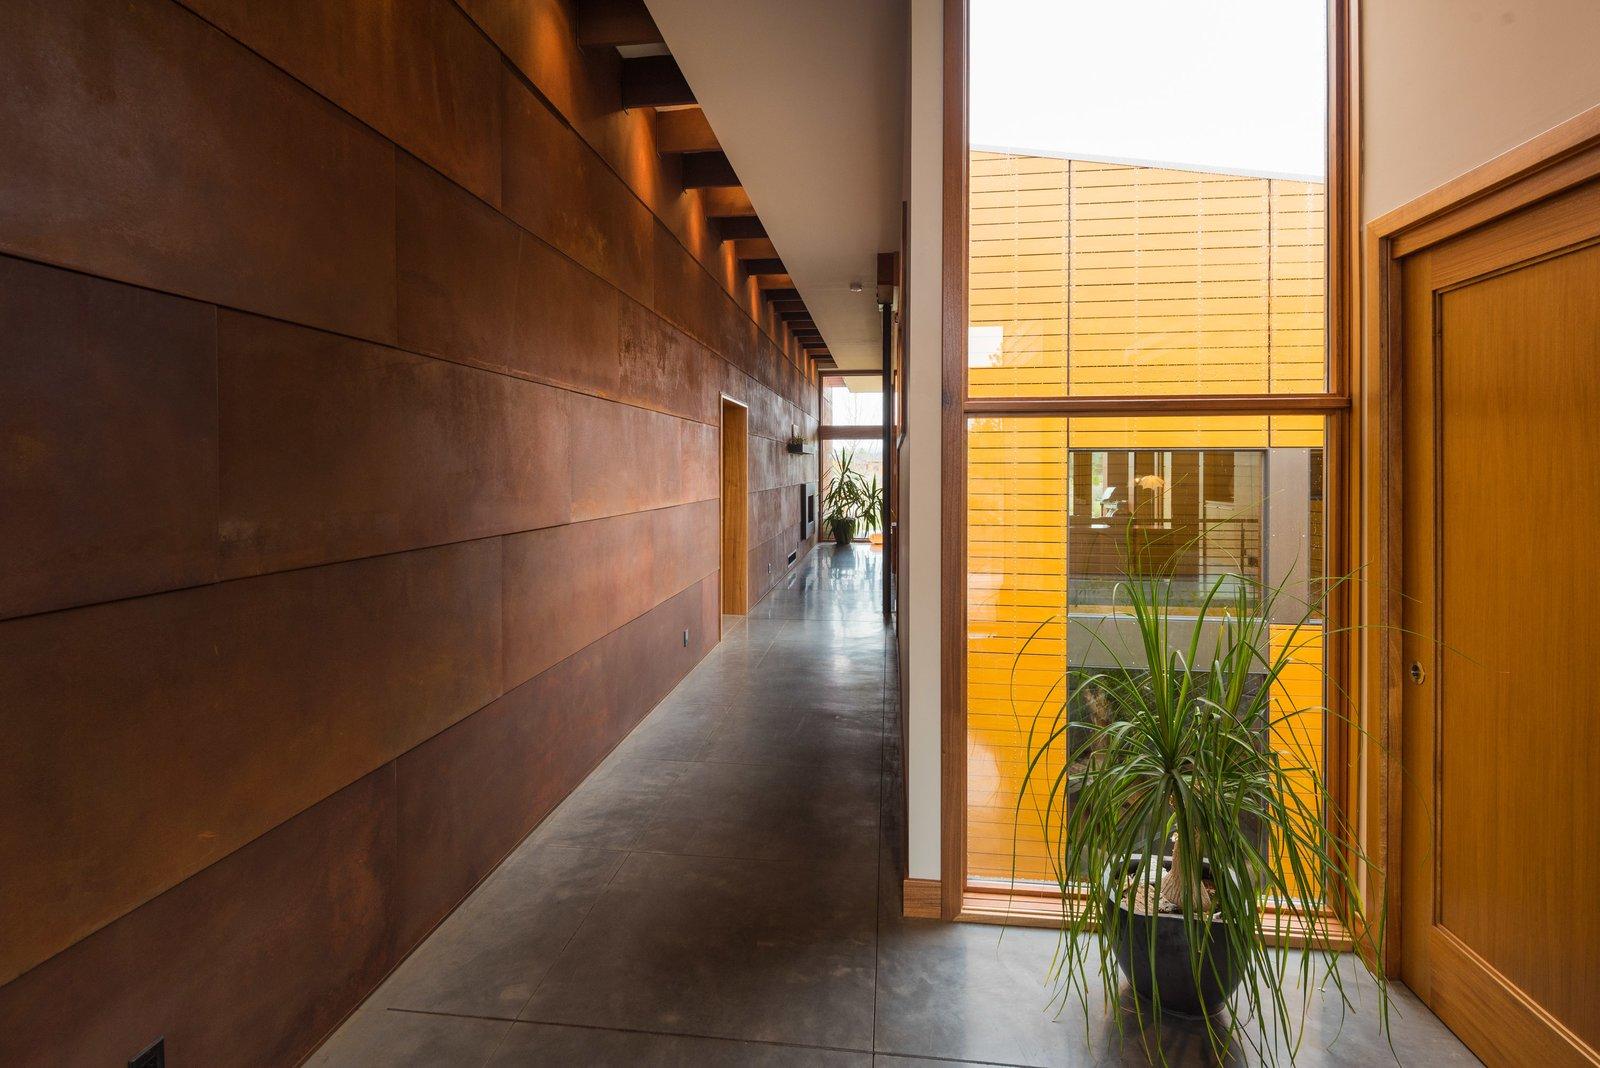 Hallway and Concrete Floor Entry  High Desert Pavillion